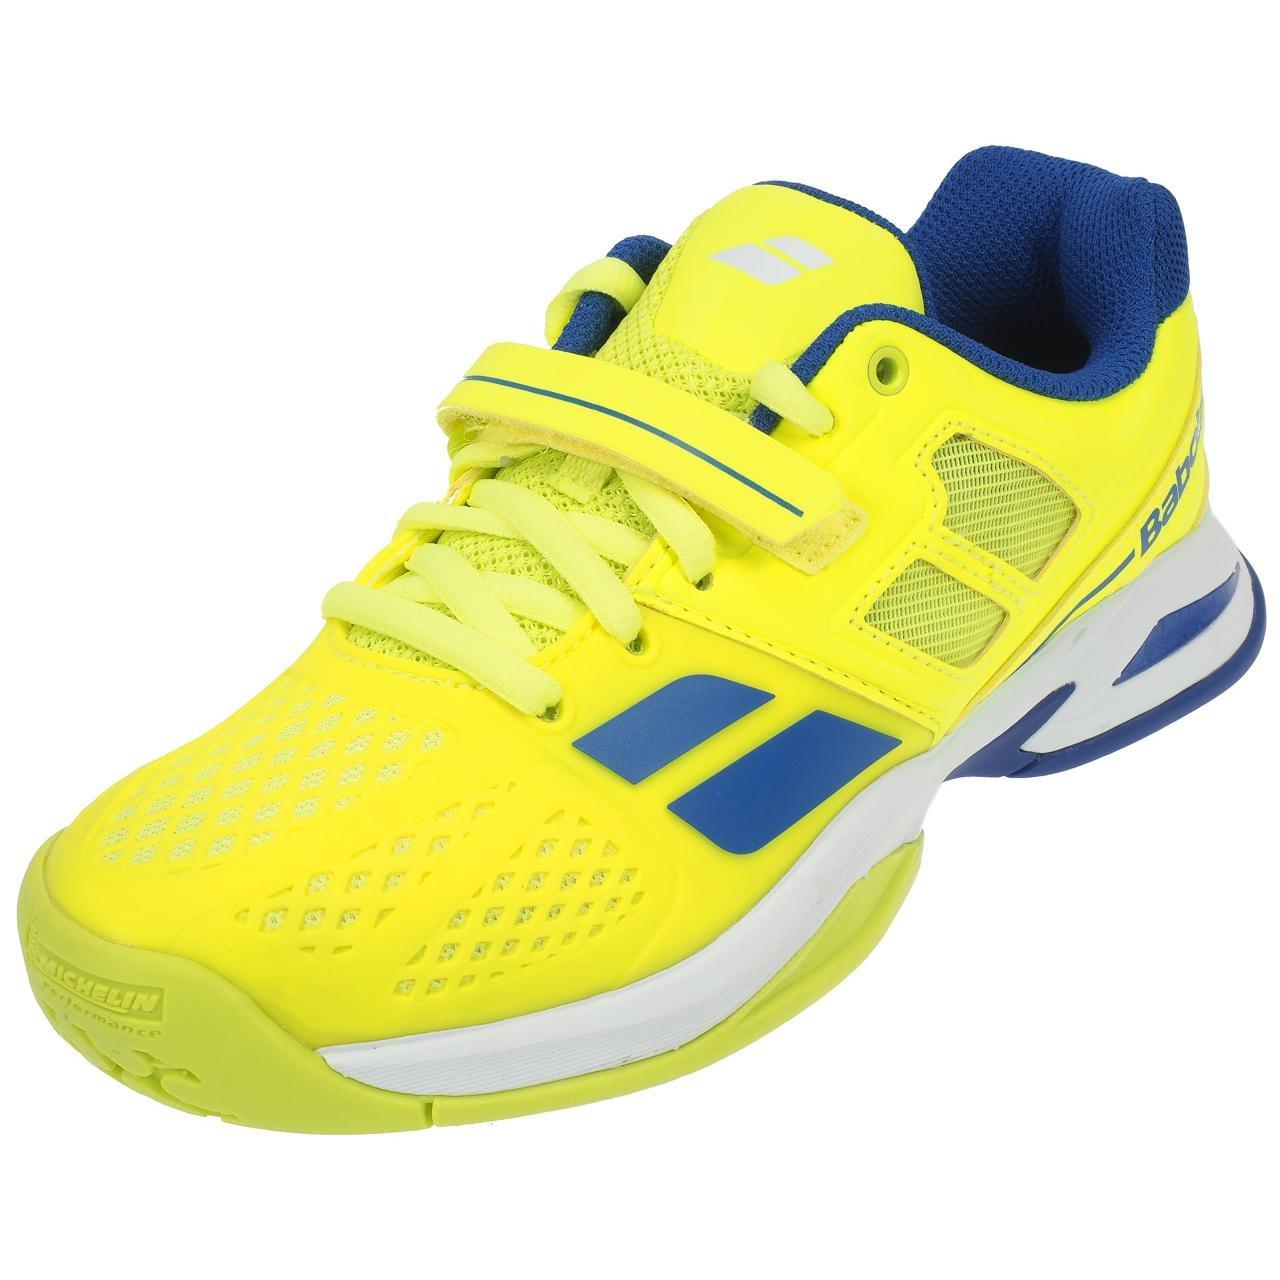 Chaussures Junior Babolat Propulse Jaune Bleu